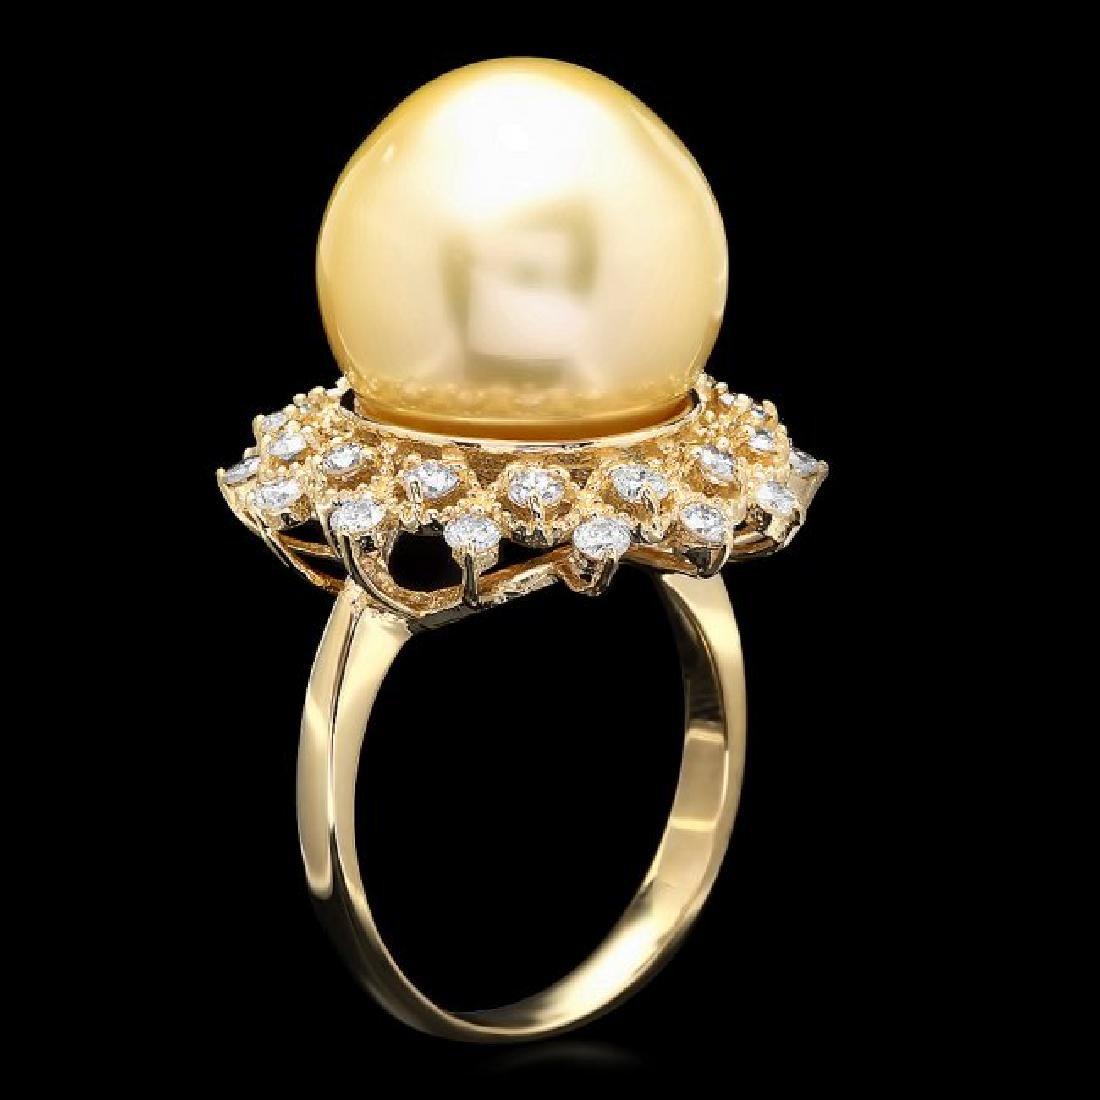 14k Gold 14 X 14mm Pearl 0.90ct Diamond Ring - 2